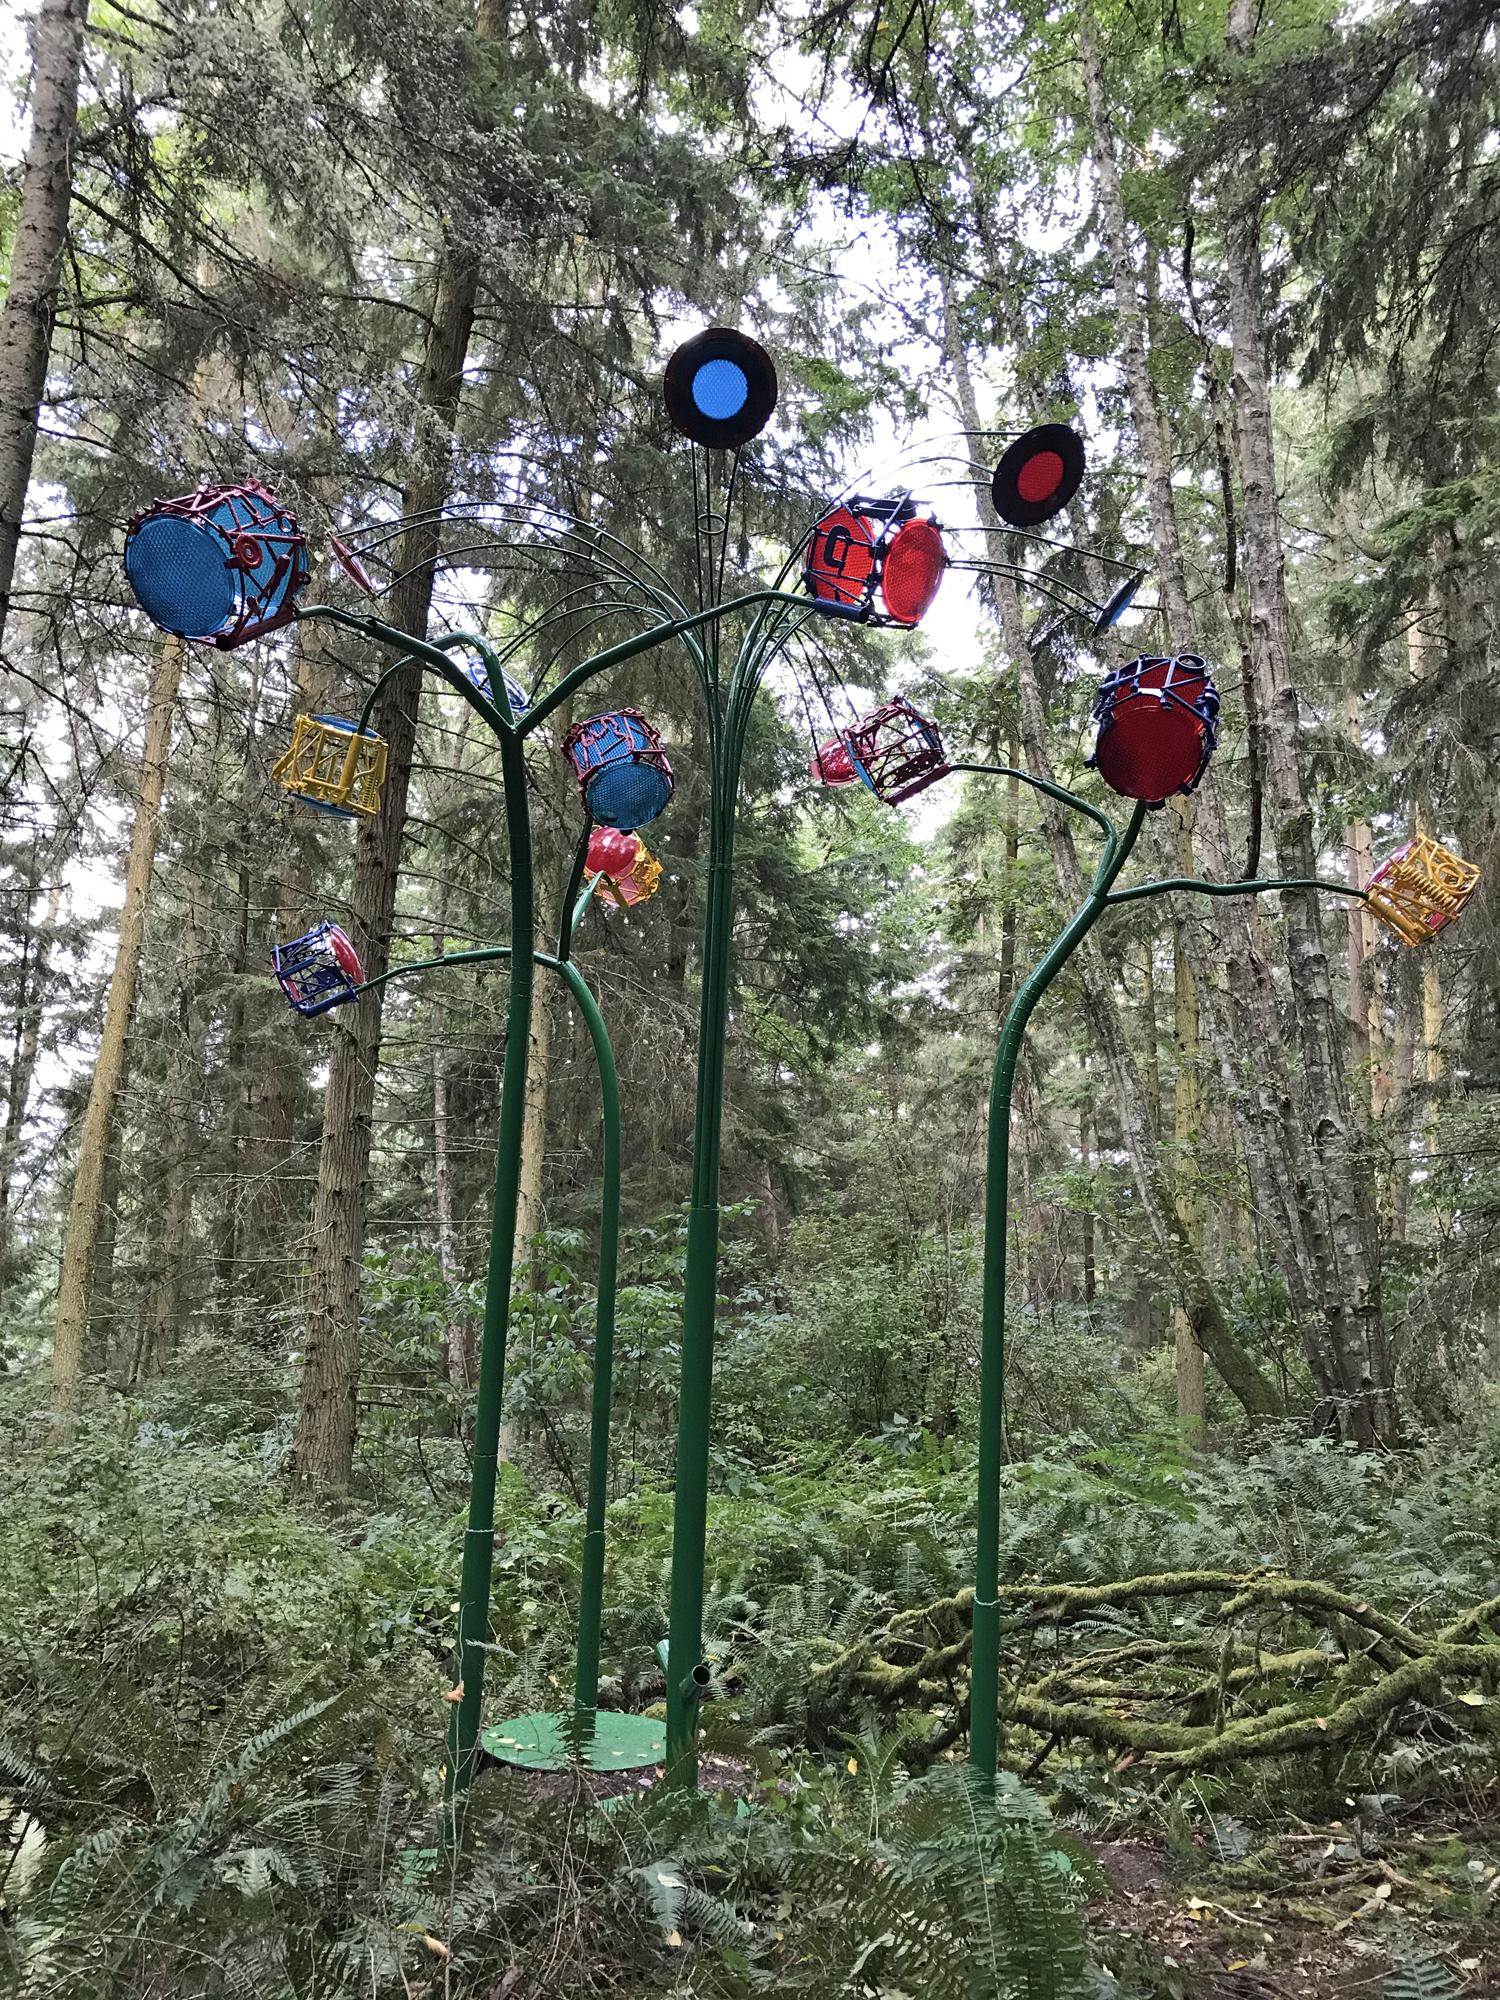 Playa Flowers sculpture by sculptor Jeff Tangen at Price Sculpture Forest